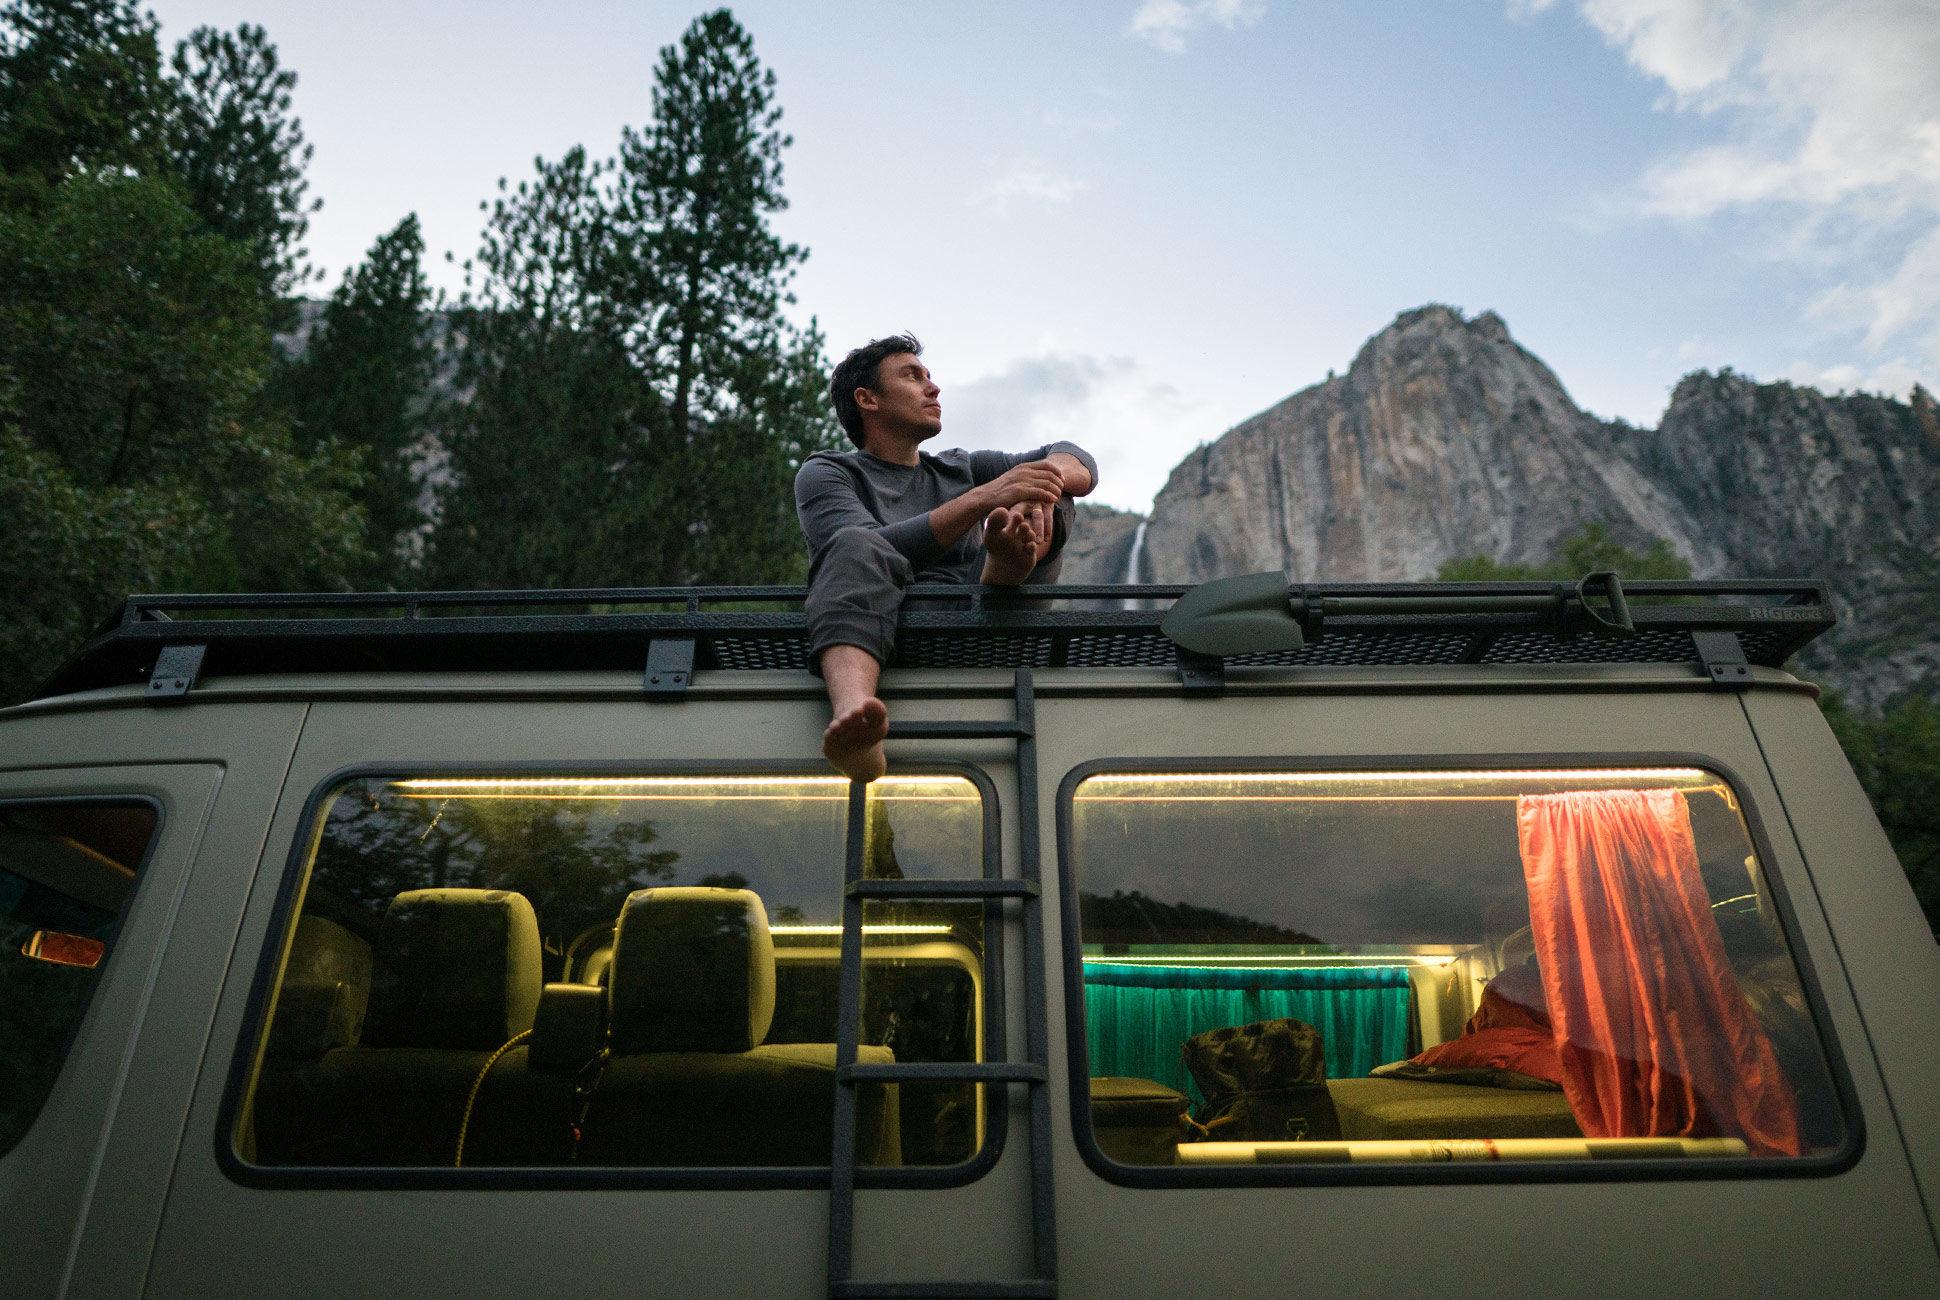 With a Custom Mercedes-Benz Van, Chris Burkard Seeks to Cover New Ground in Adventure Photography - An inside look at Chris Burkard's custom, adventure-ready Mercedes-Benz Sprinter van.